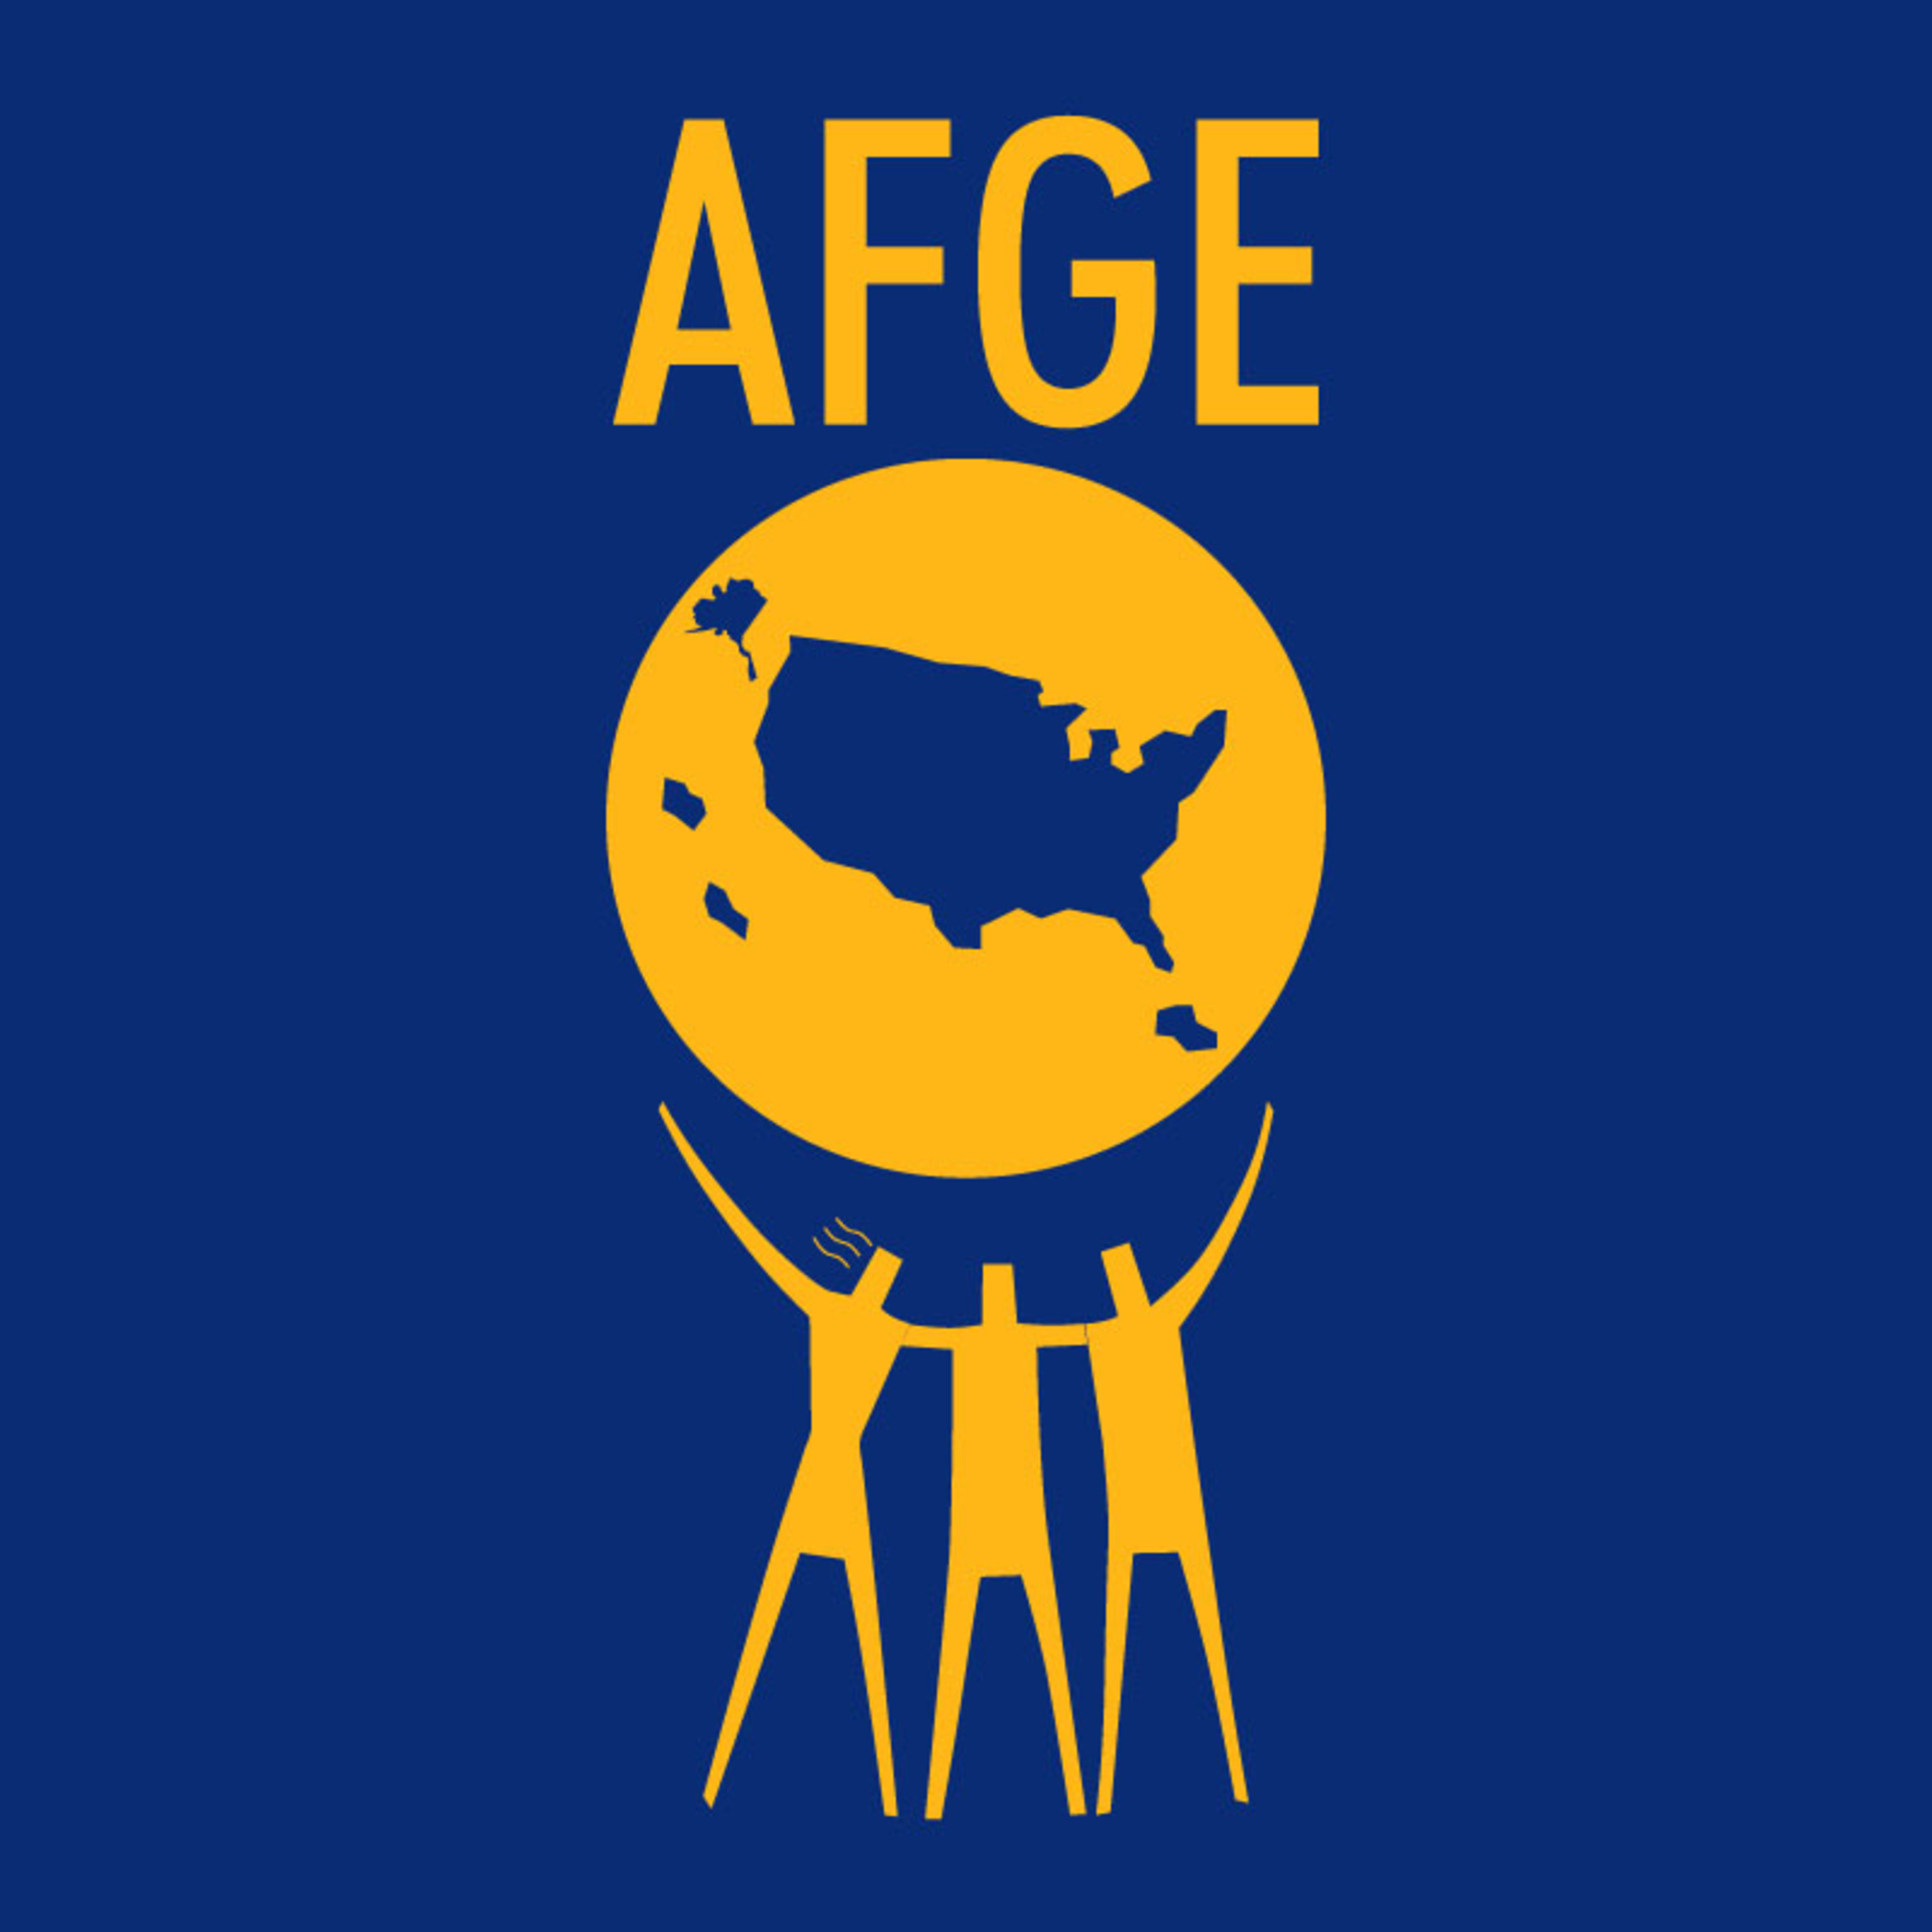 AFGE logo.